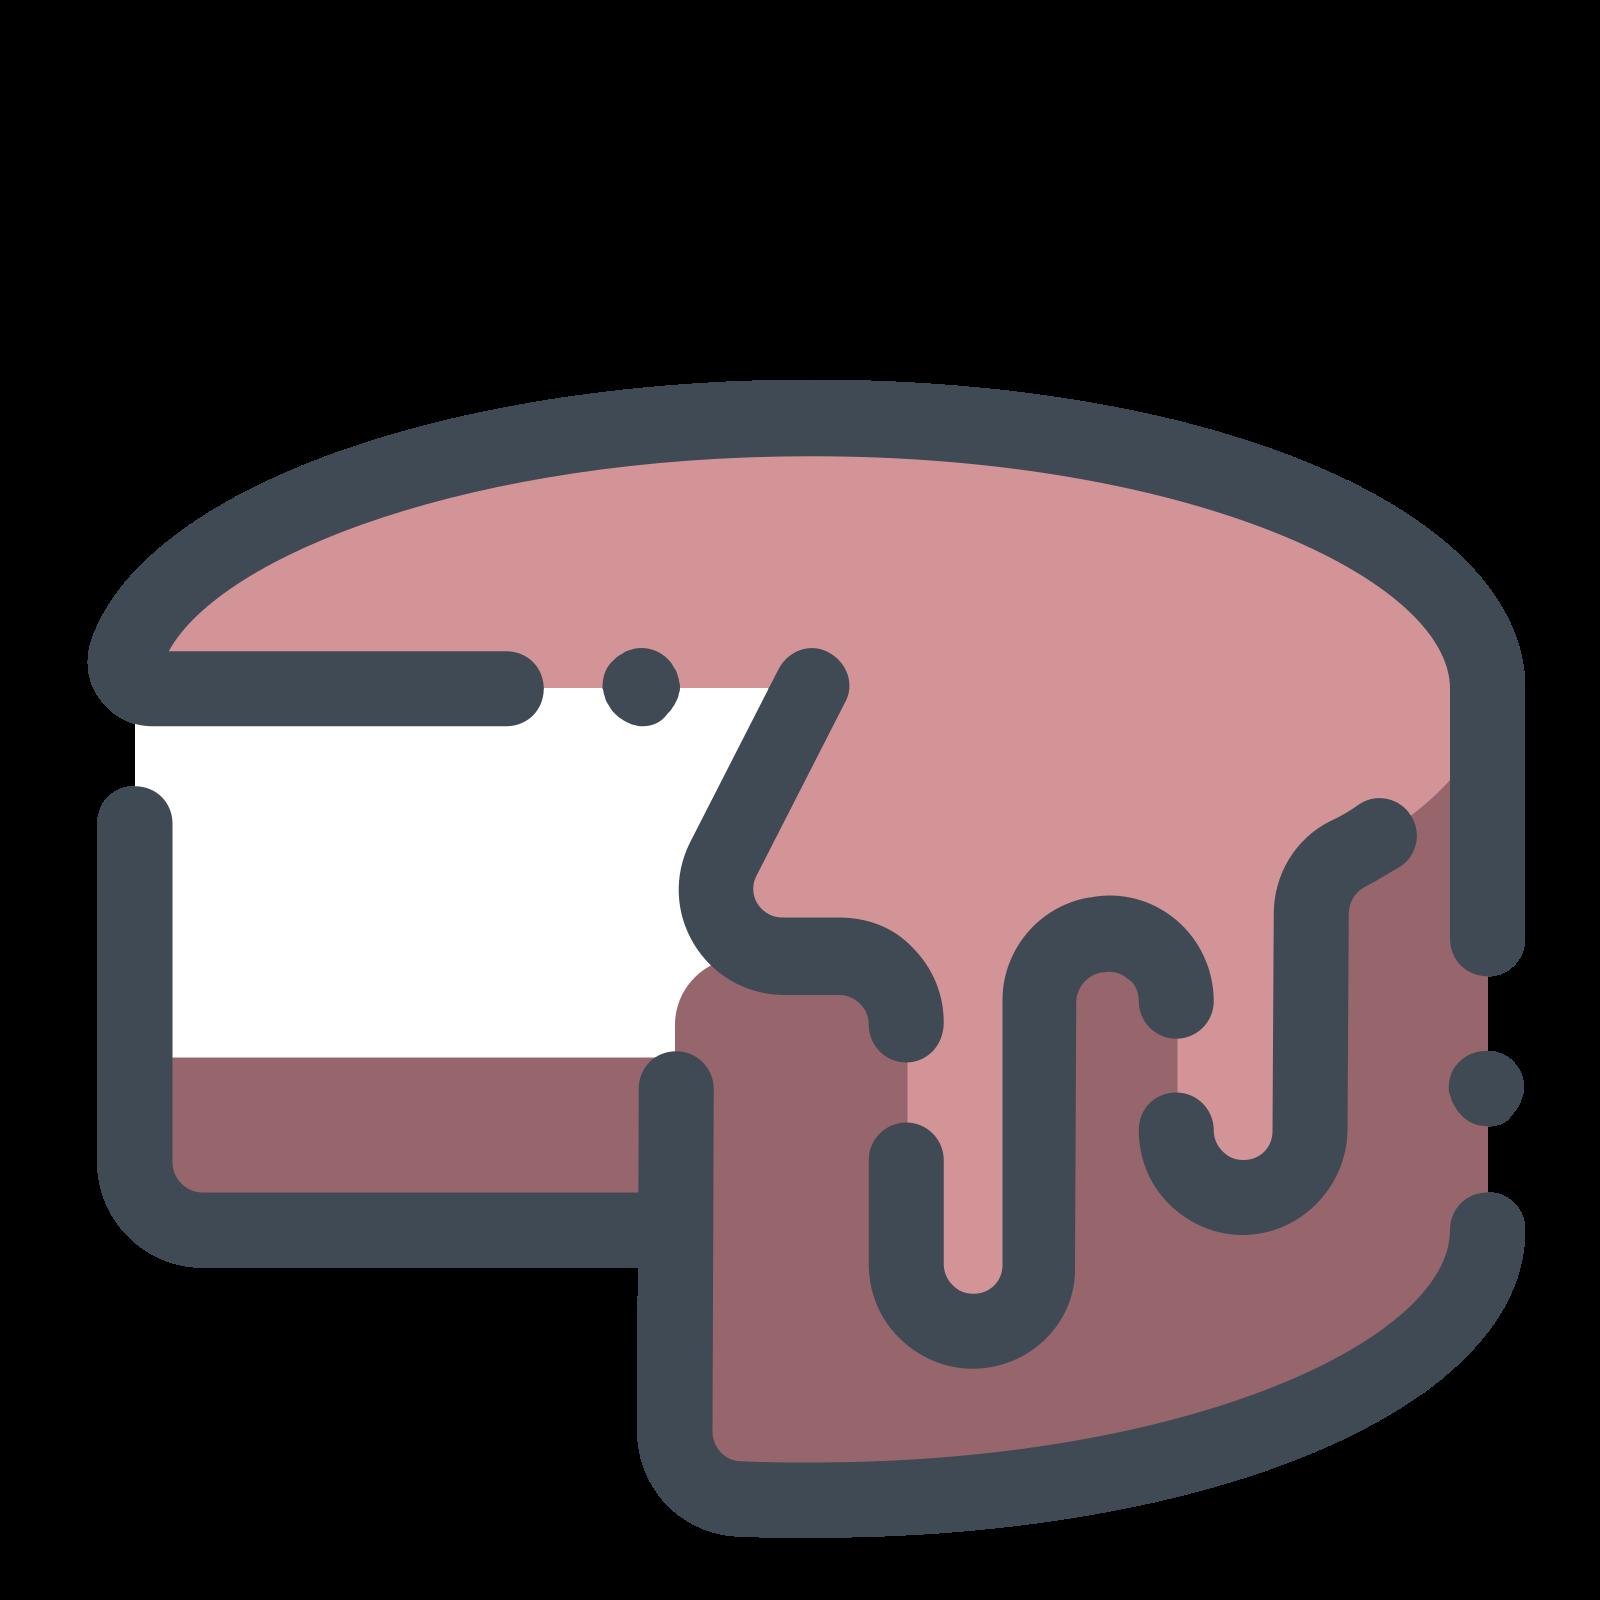 Double Chocolate Cake icon